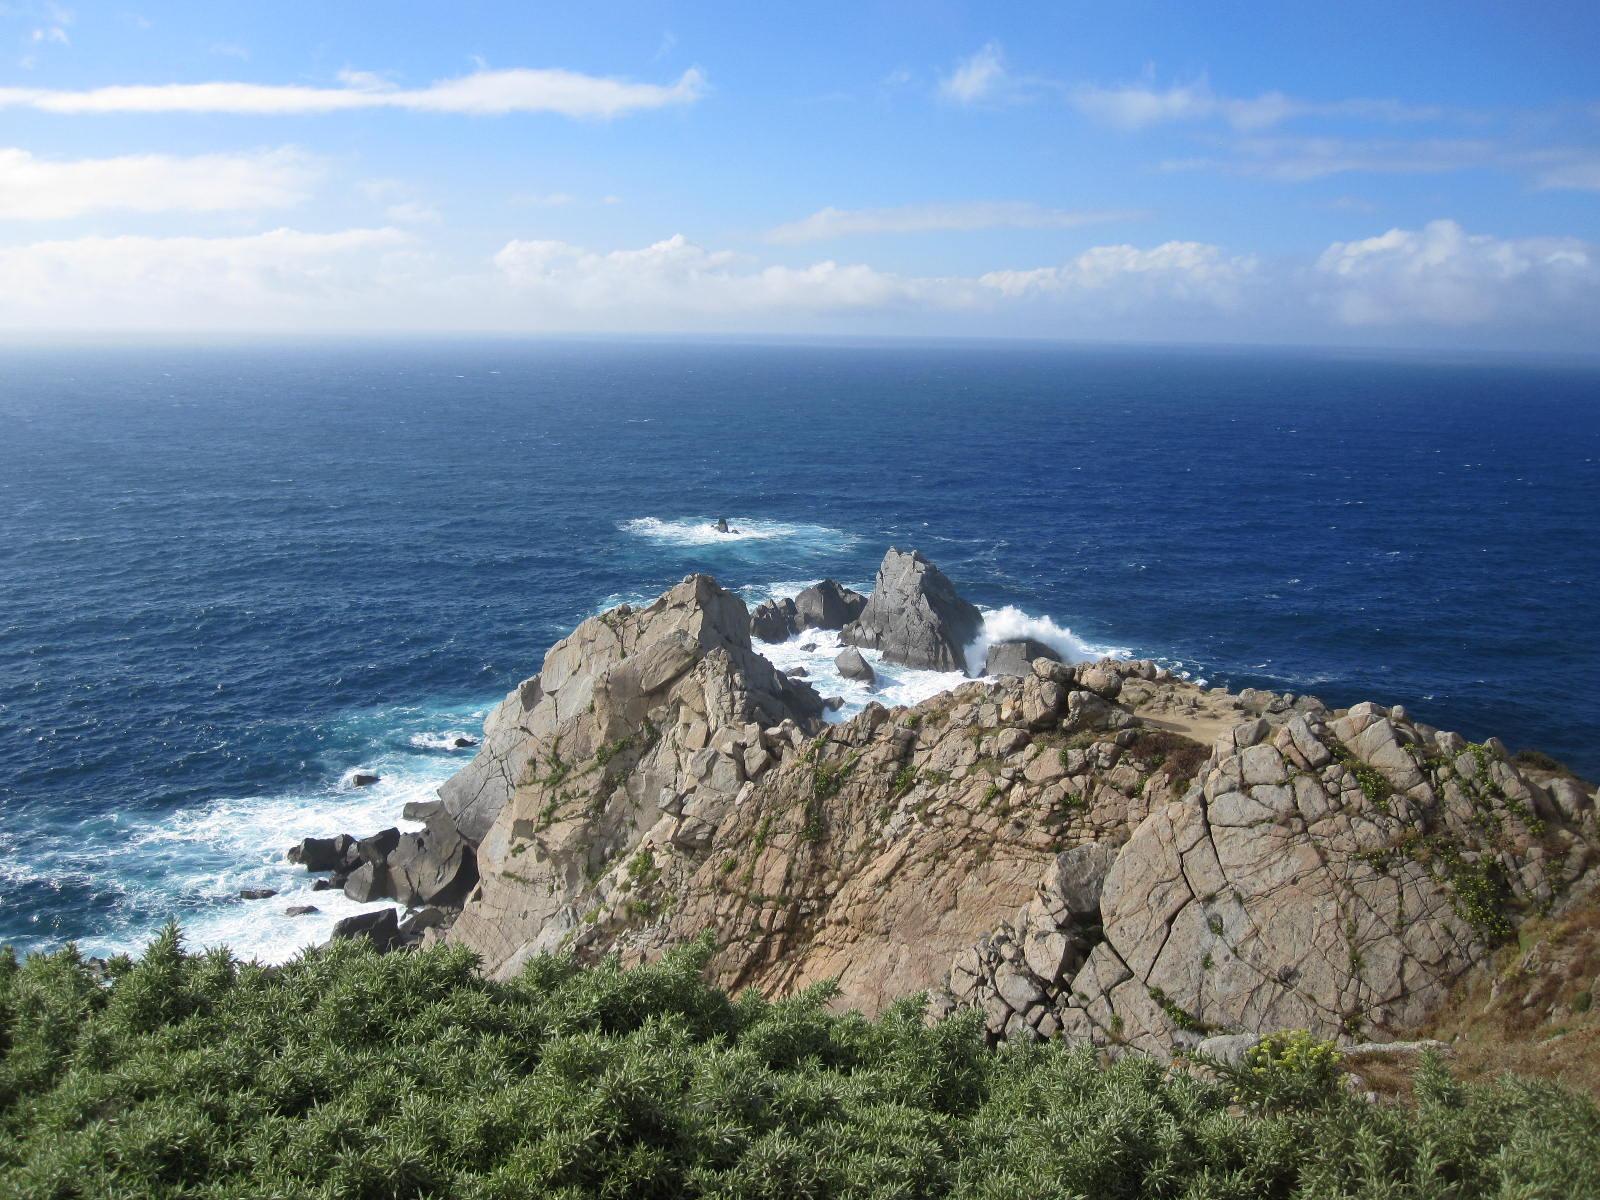 File:Cabo - Punta Estaca de Bares.JPG - Wikimedia Commons